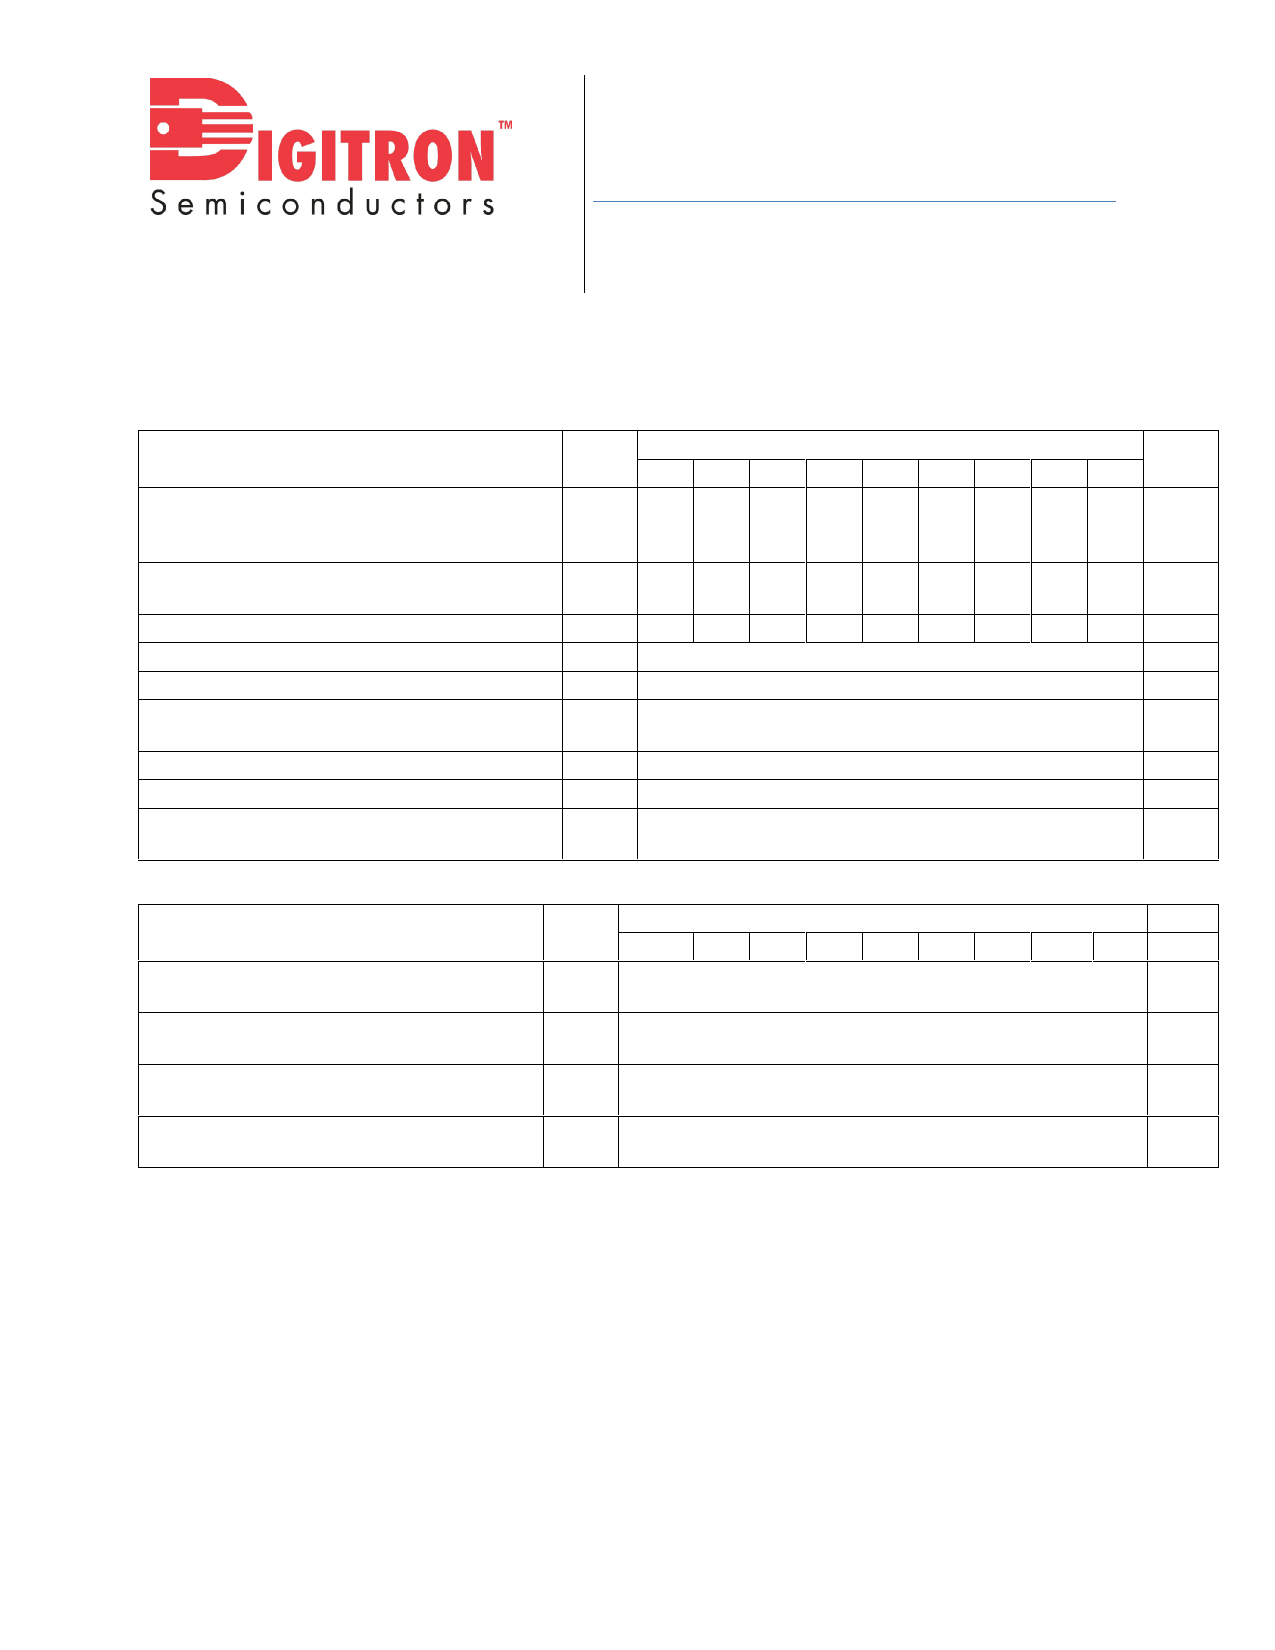 MR1130 데이터시트 및 MR1130 PDF